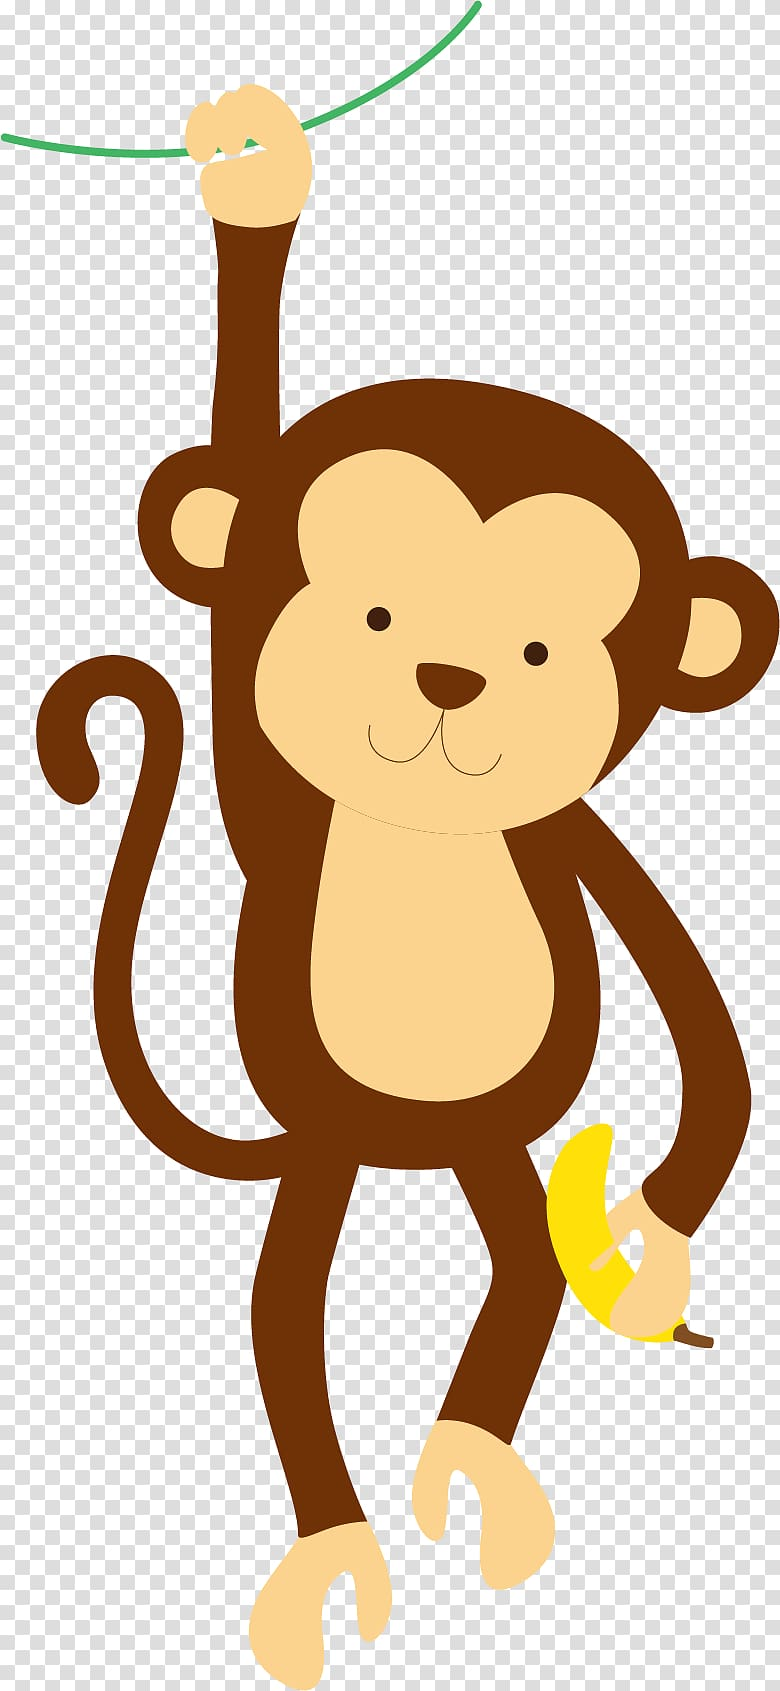 Brown monkey illustration, Giraffe Pony Monkey Cuteness.